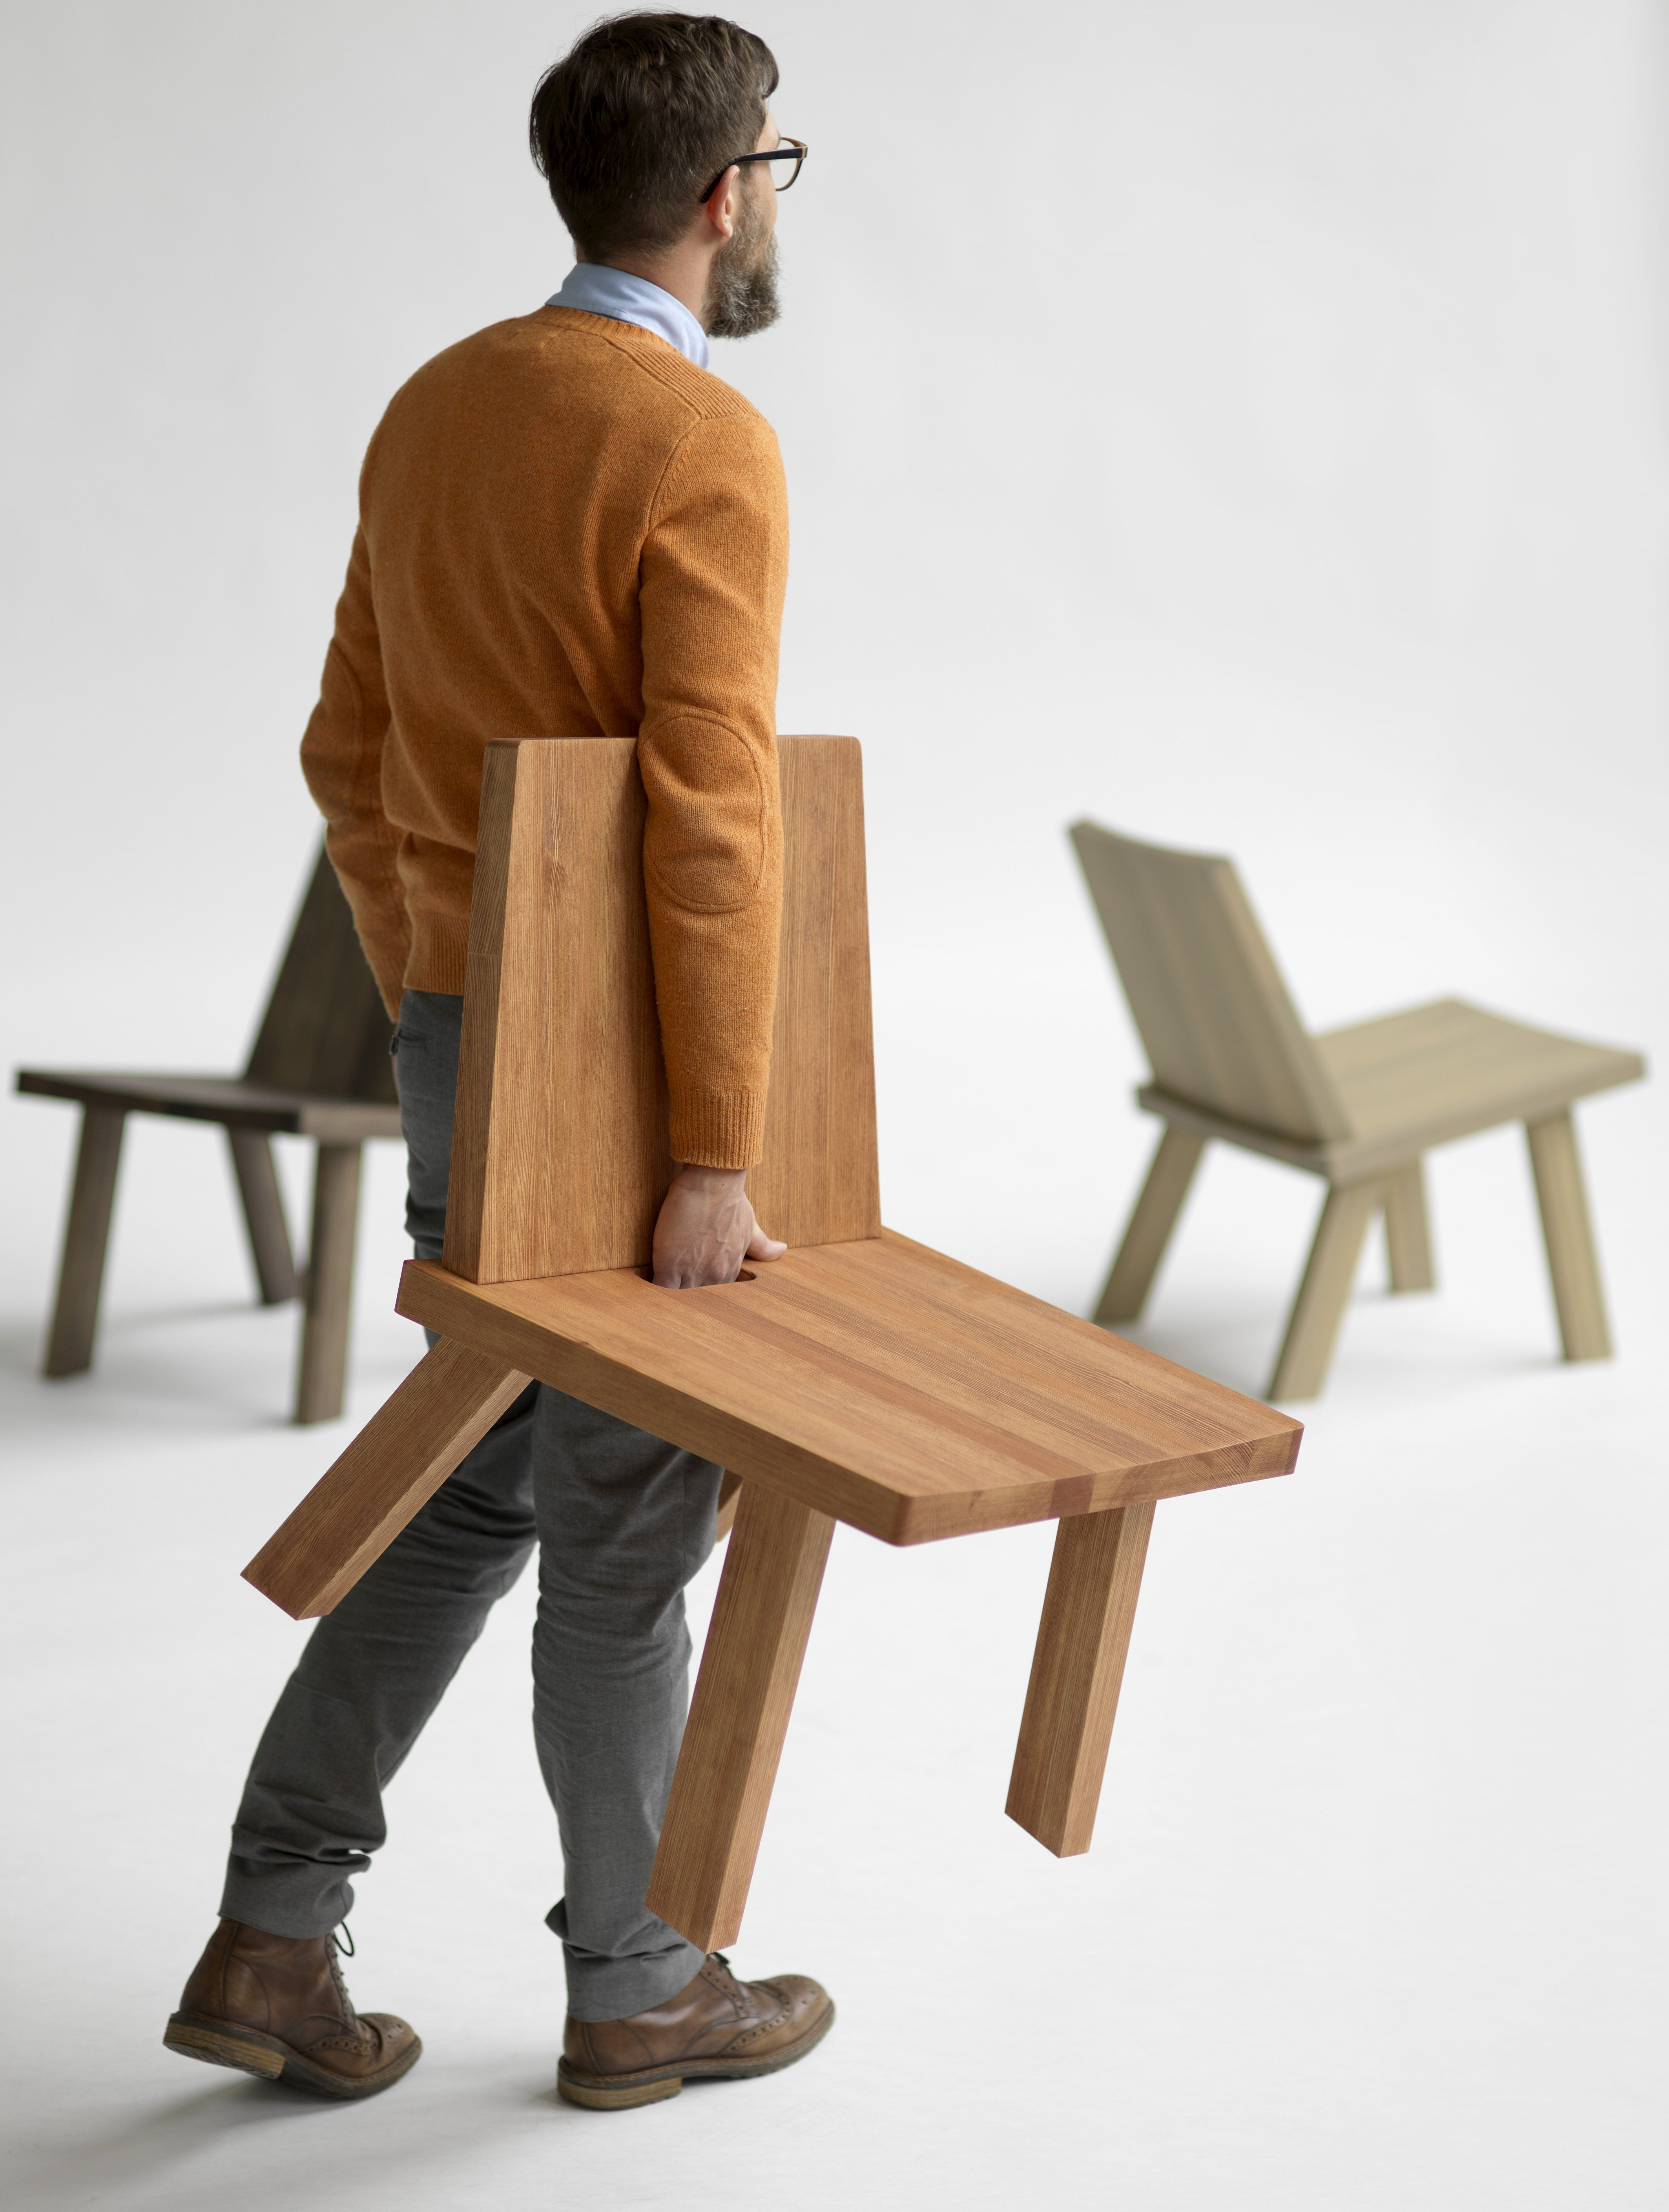 Scandinavische Design Stoelen.Pinzo Pine Chair Cadeiras Design Arquitetura E Design Design